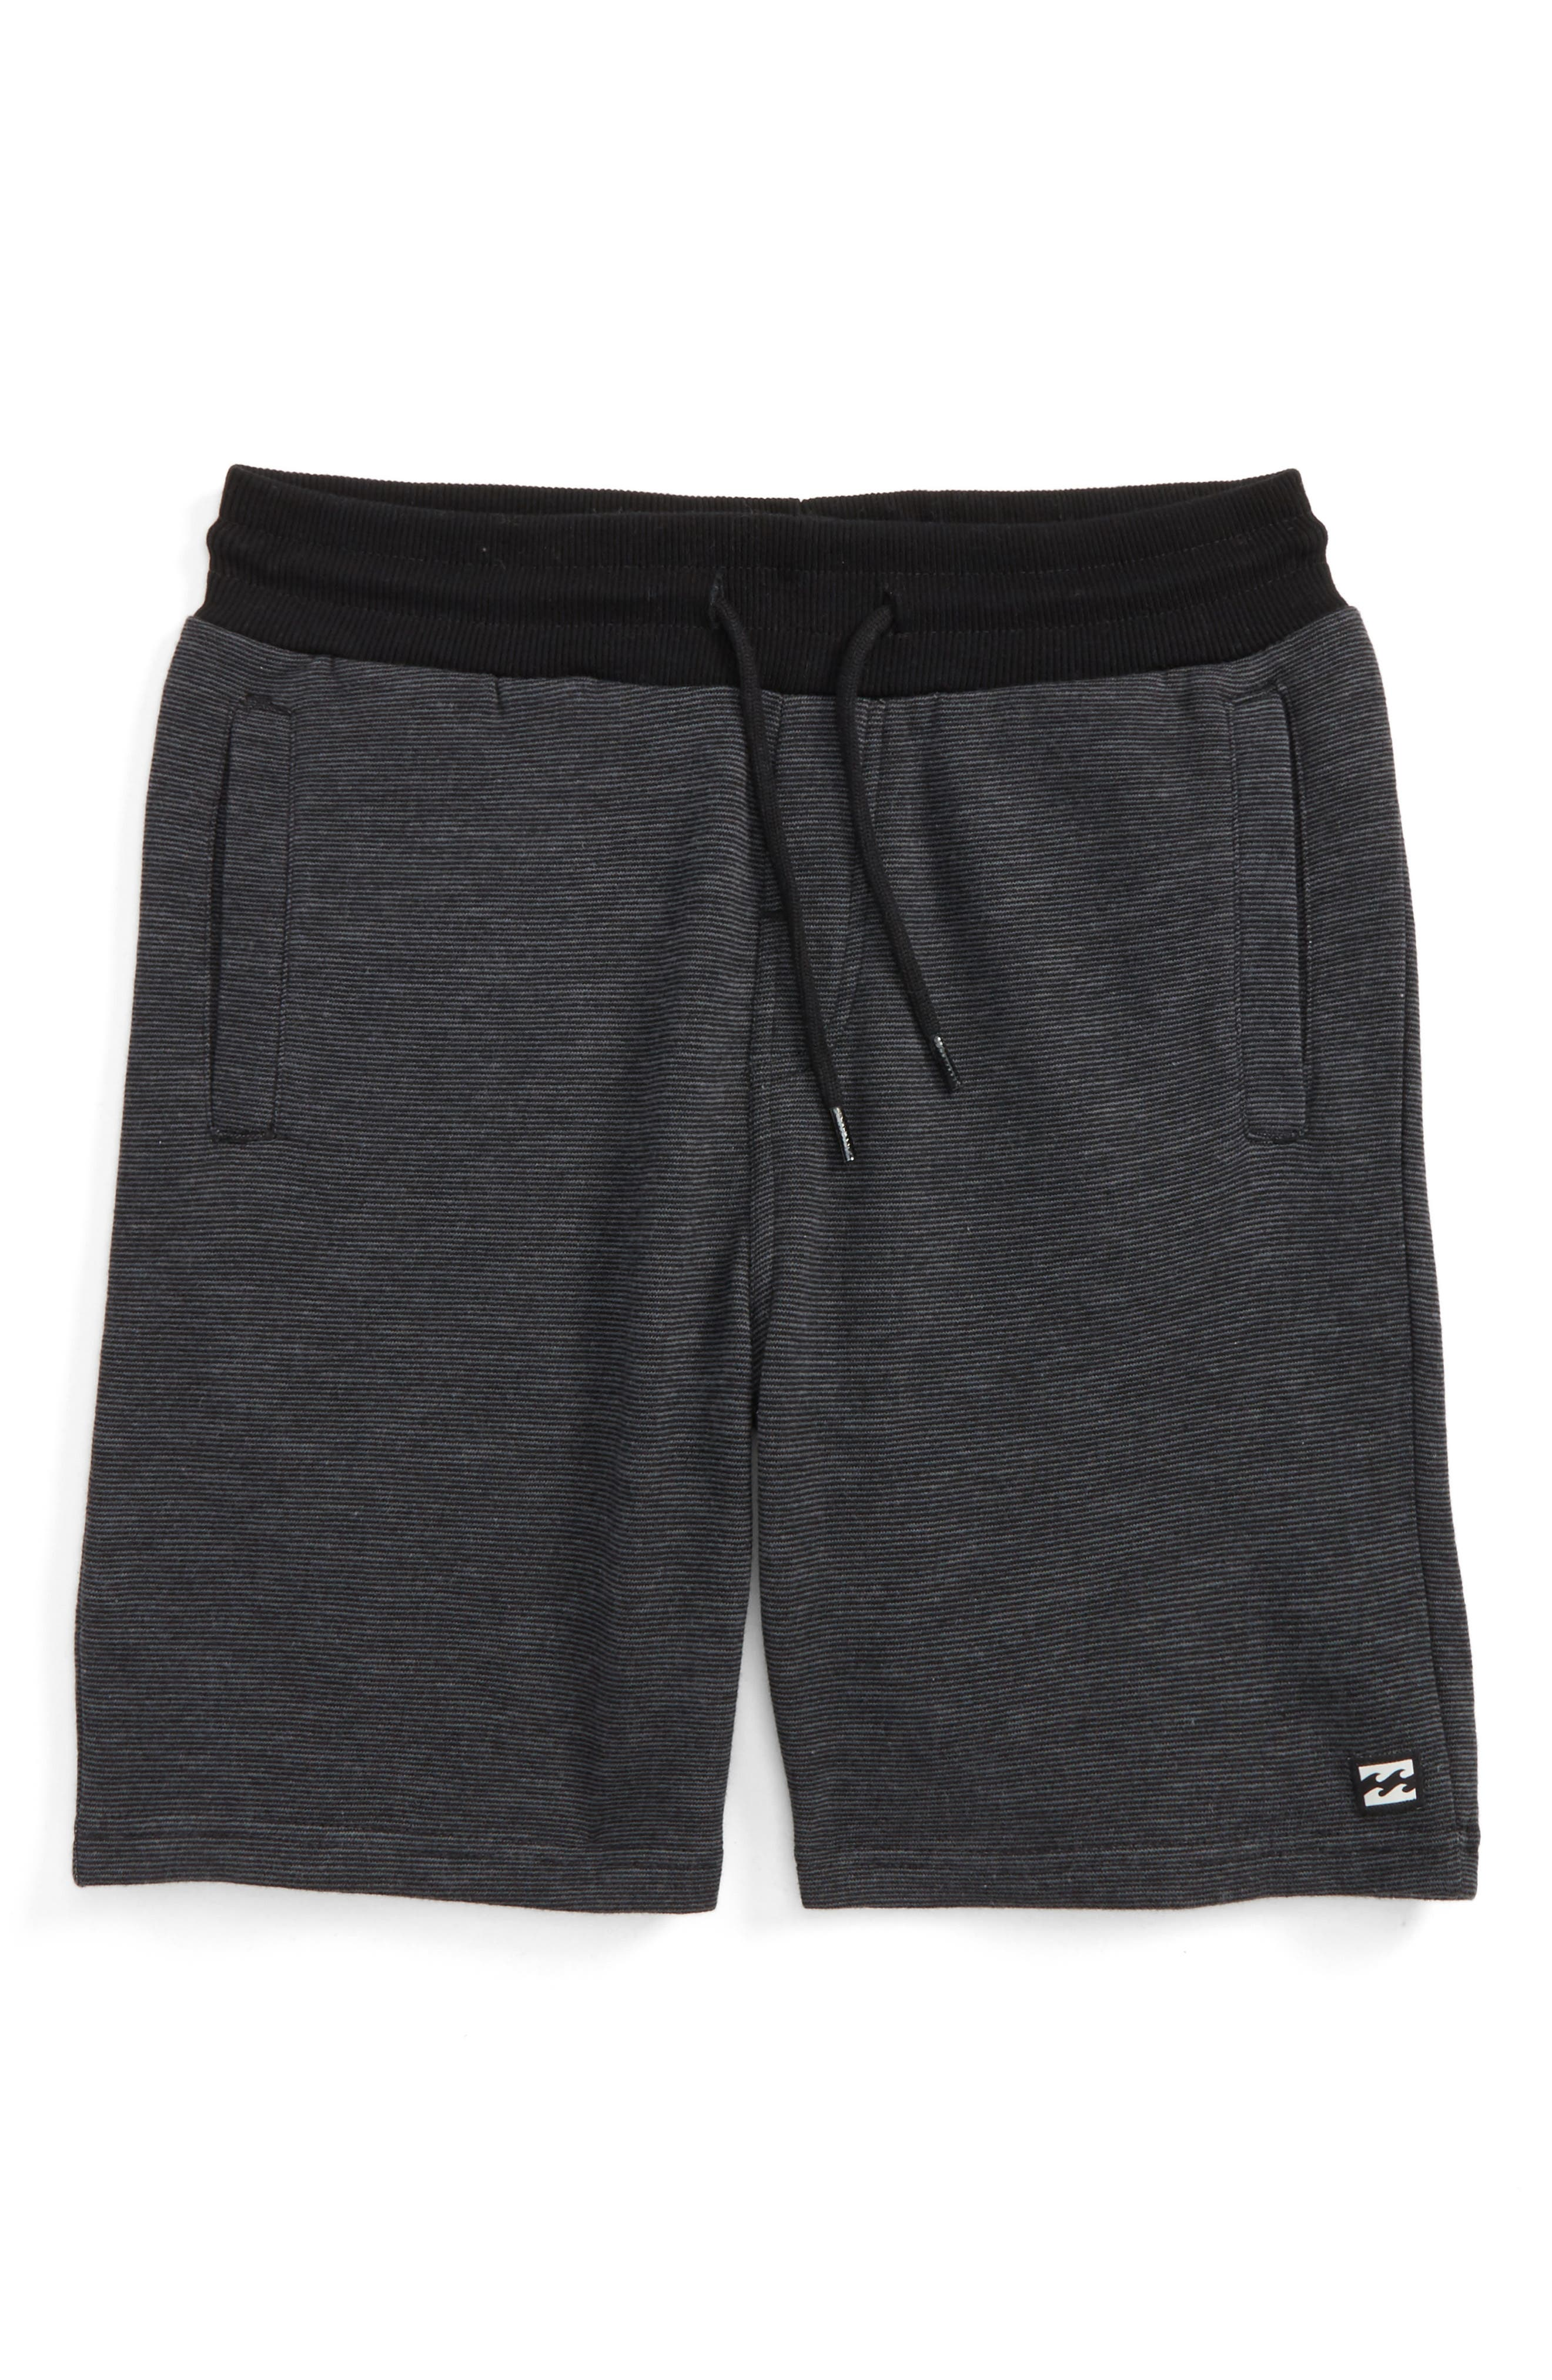 Balance Shorts,                         Main,                         color, Black Heather